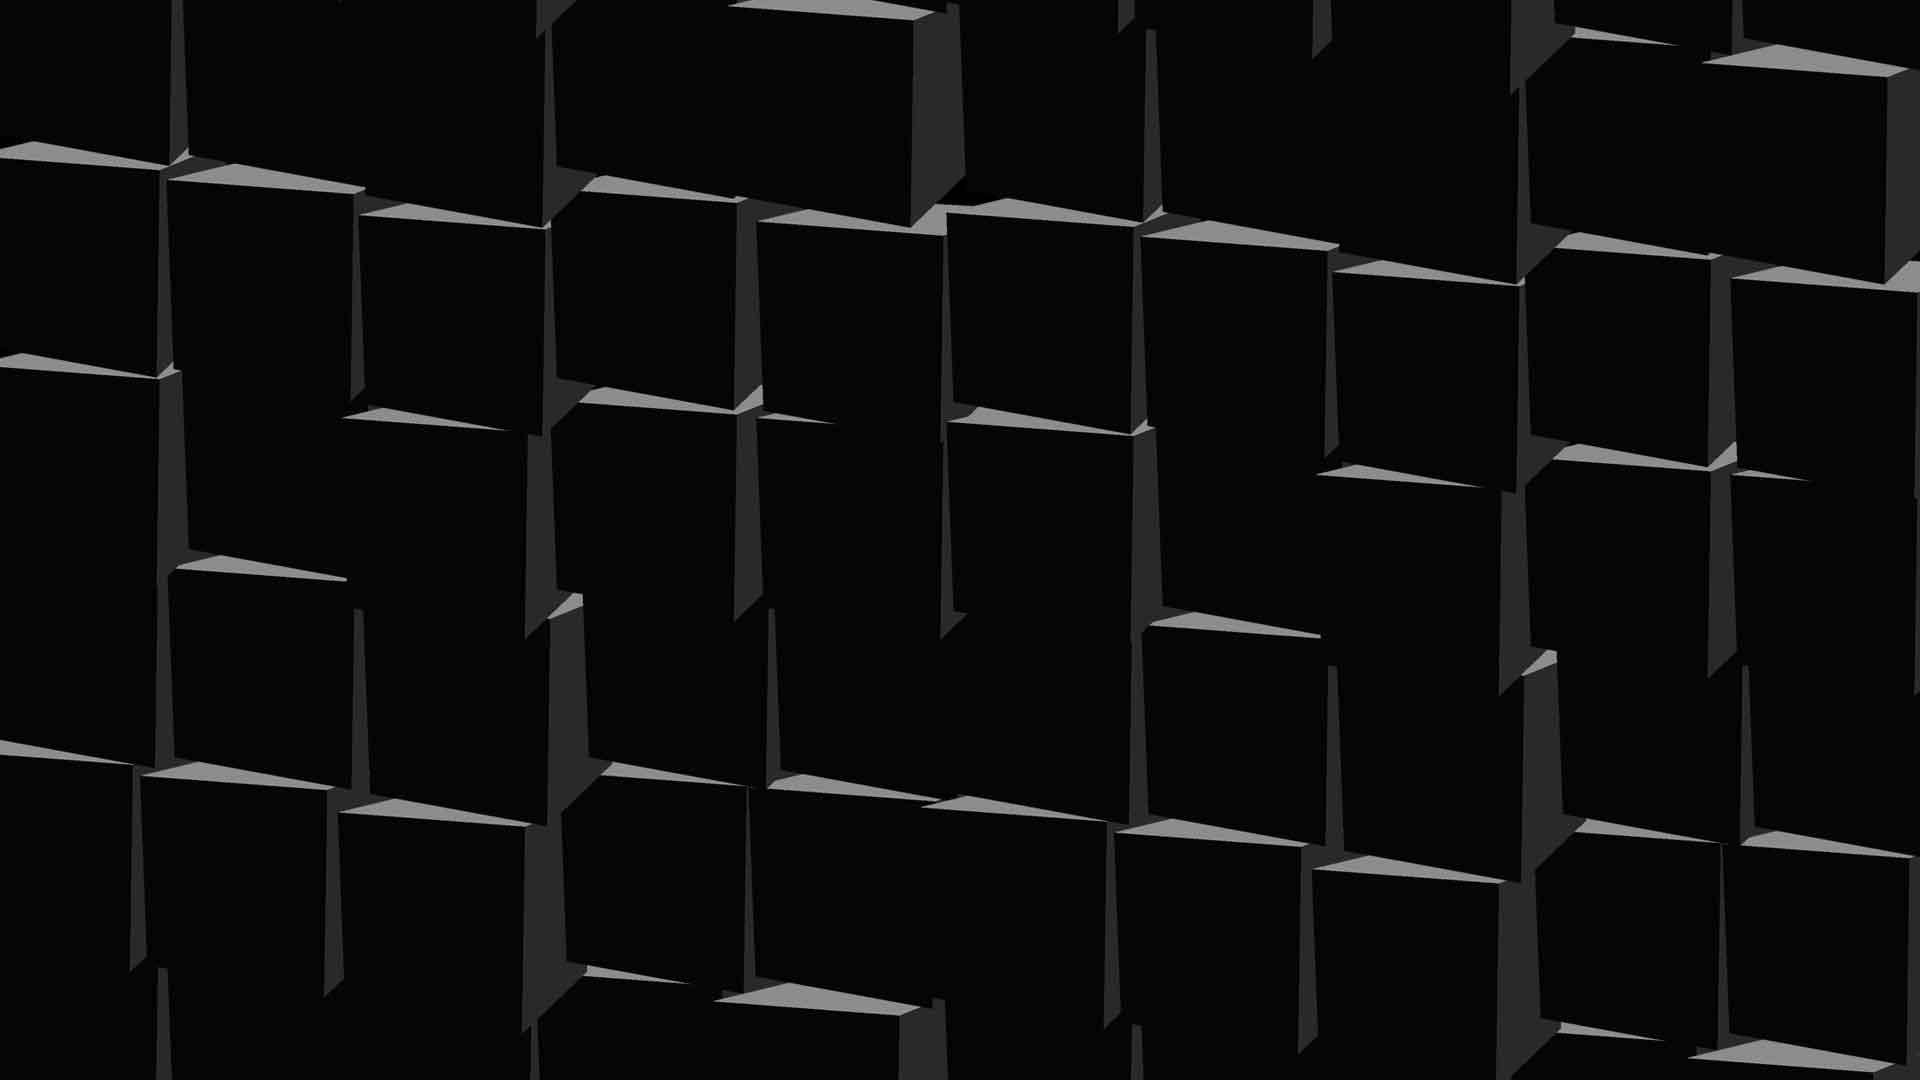 dark wallpaper images